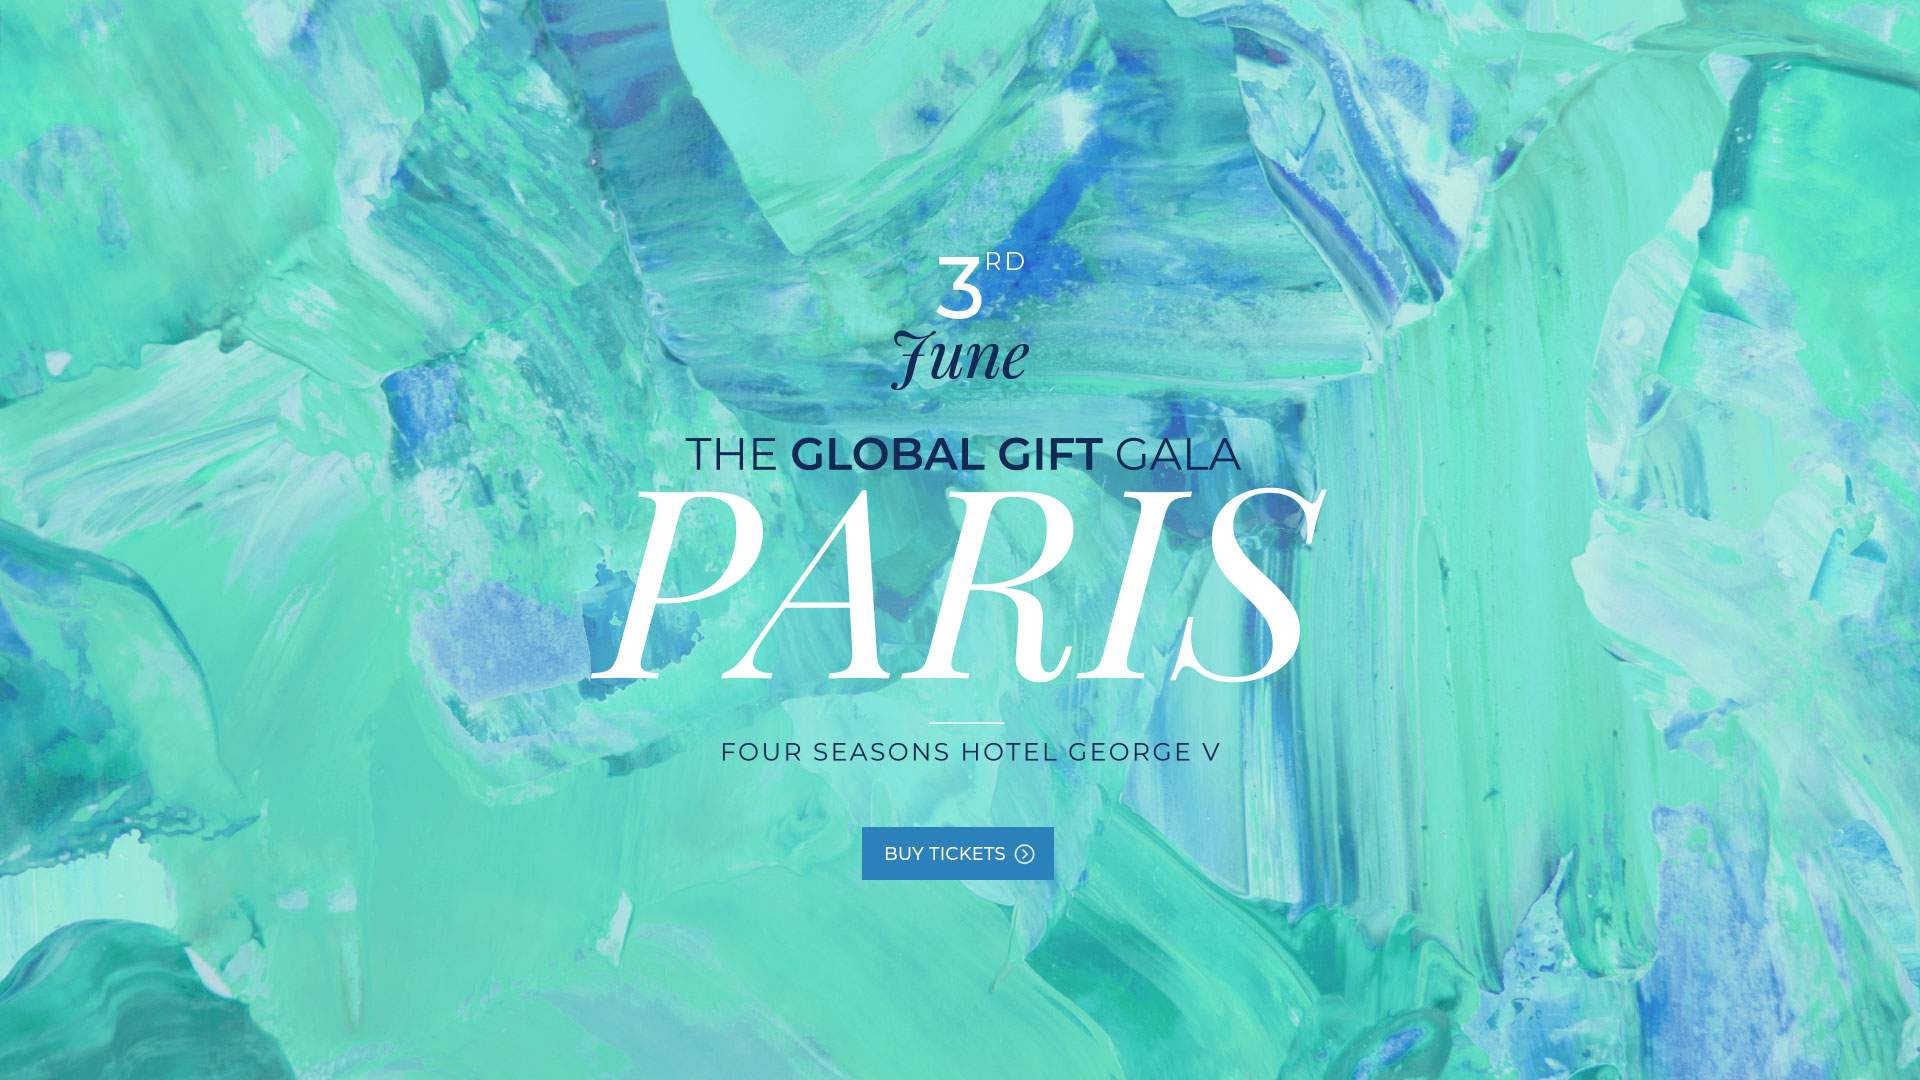 The Global Gift Gala Paris 2019